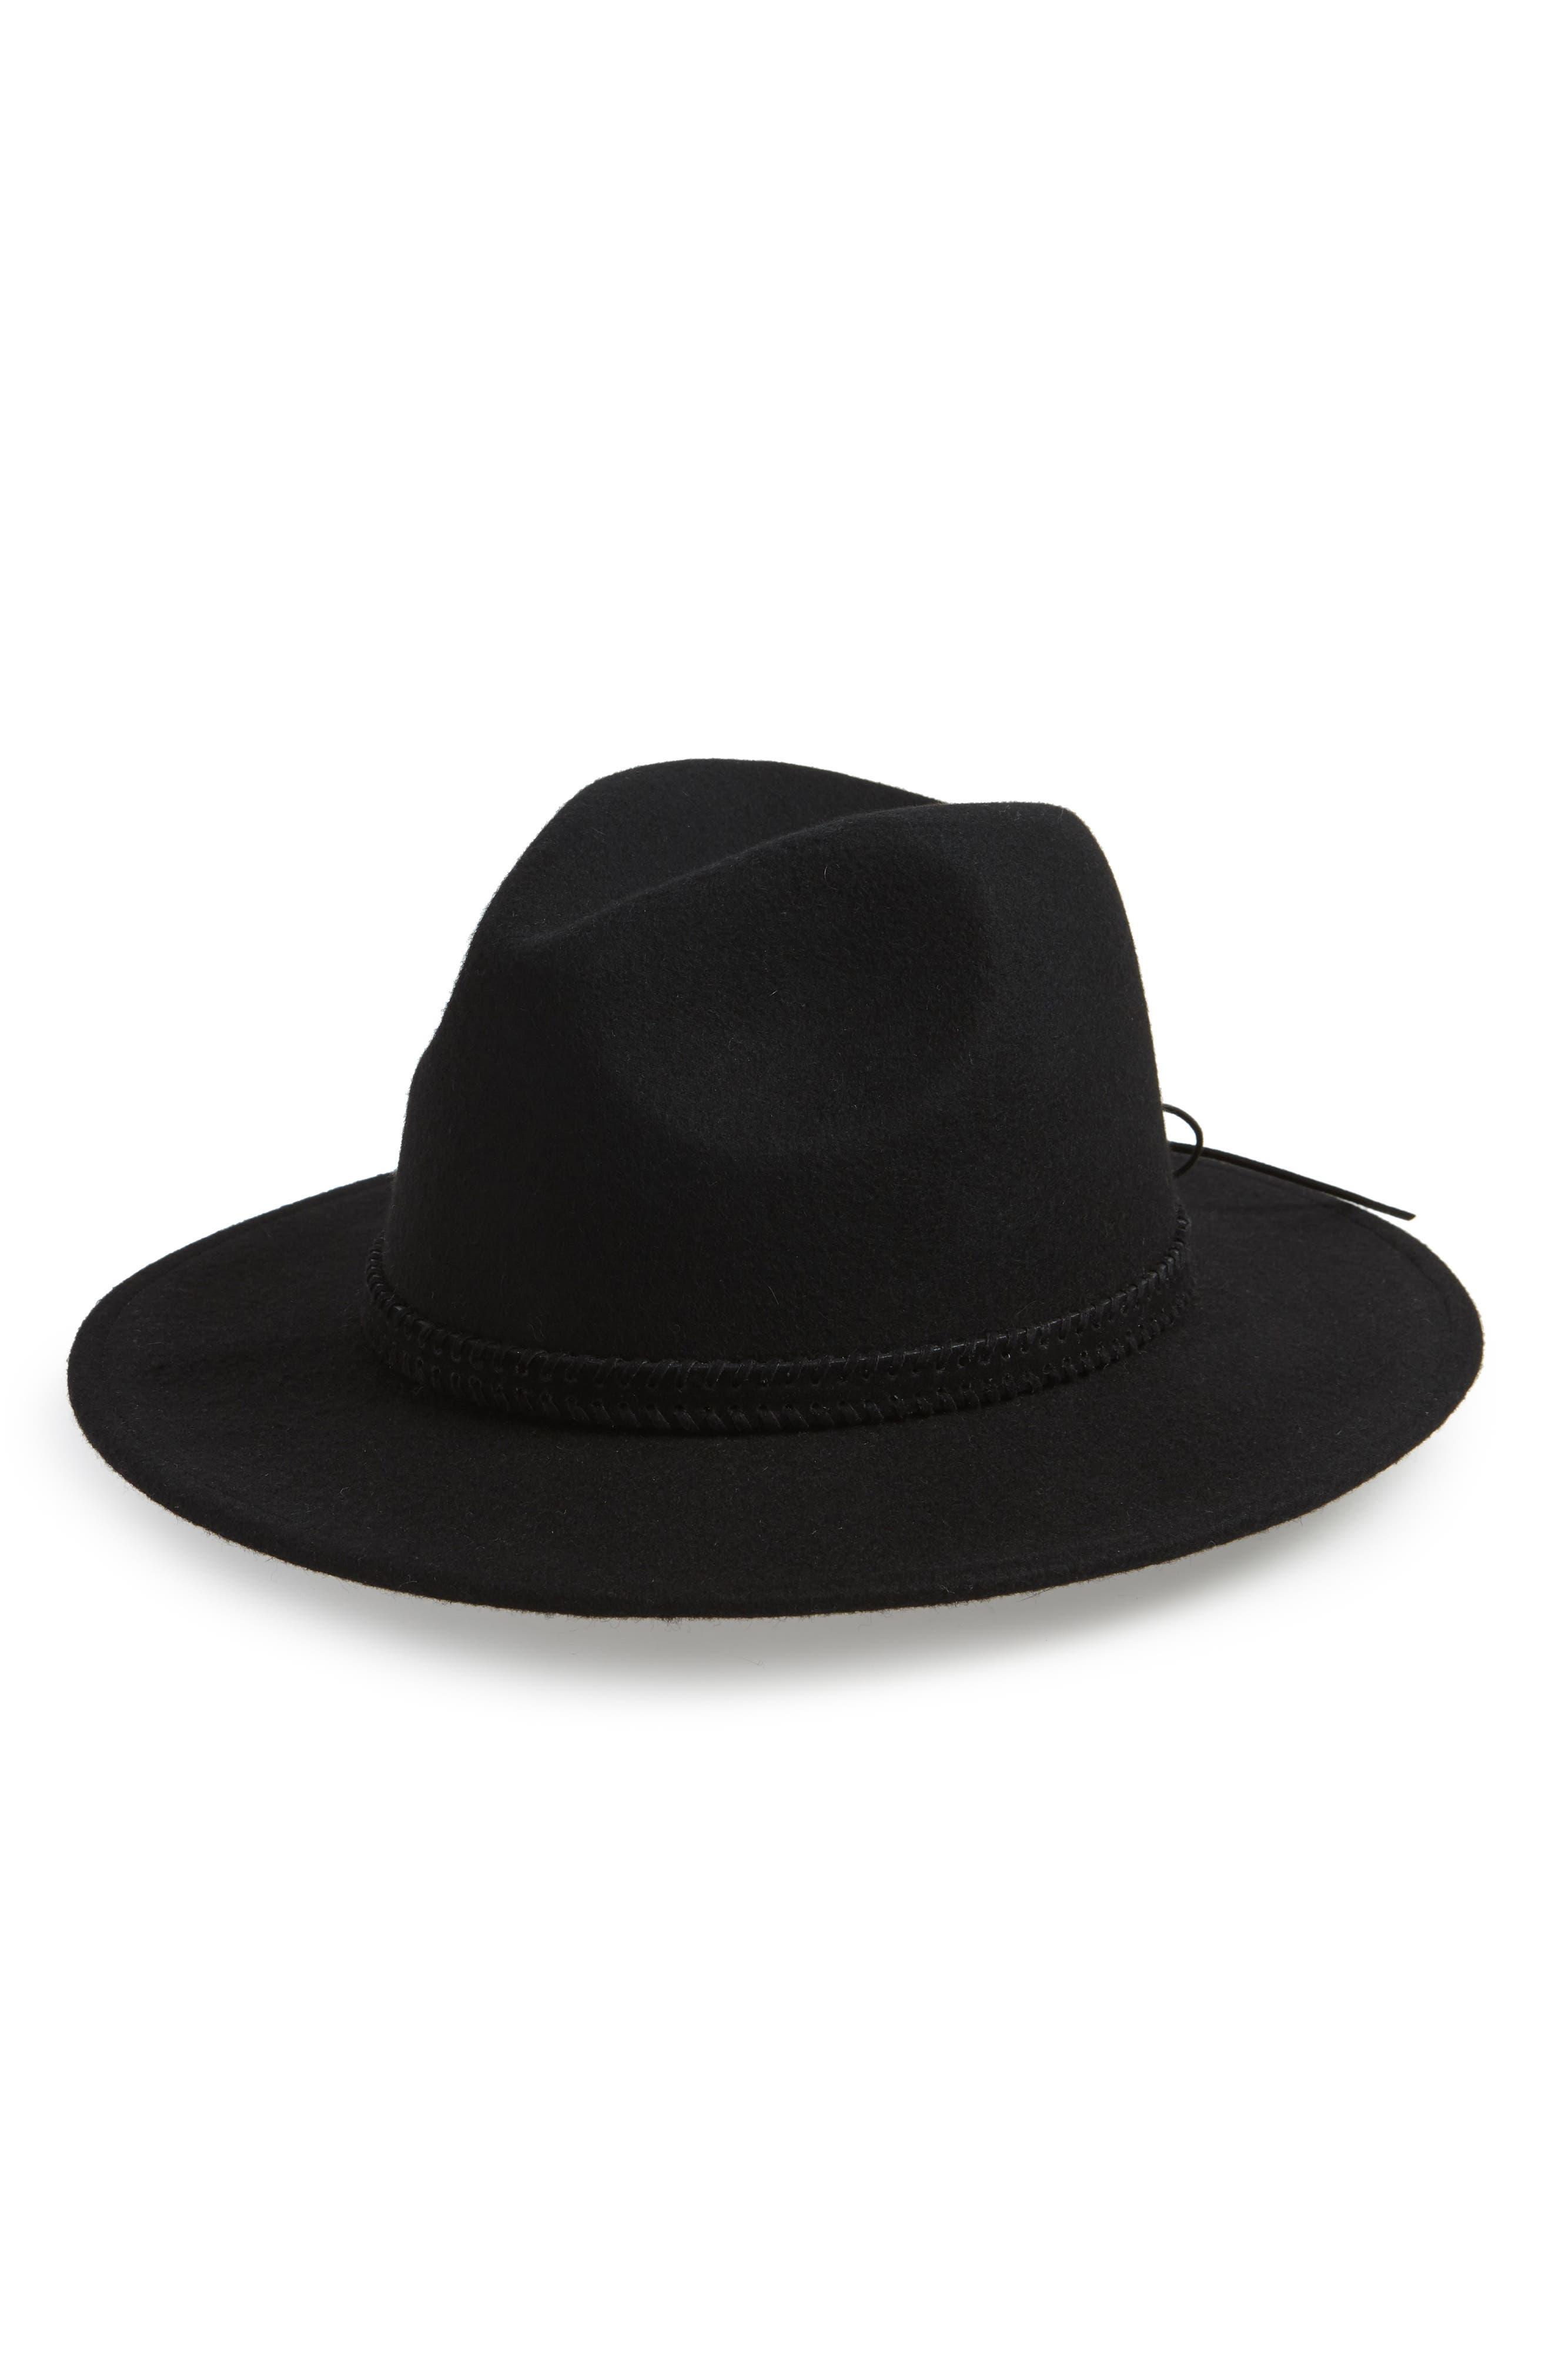 TREASURE & BOND,                             Felt Panama Hat,                             Main thumbnail 1, color,                             BLACK